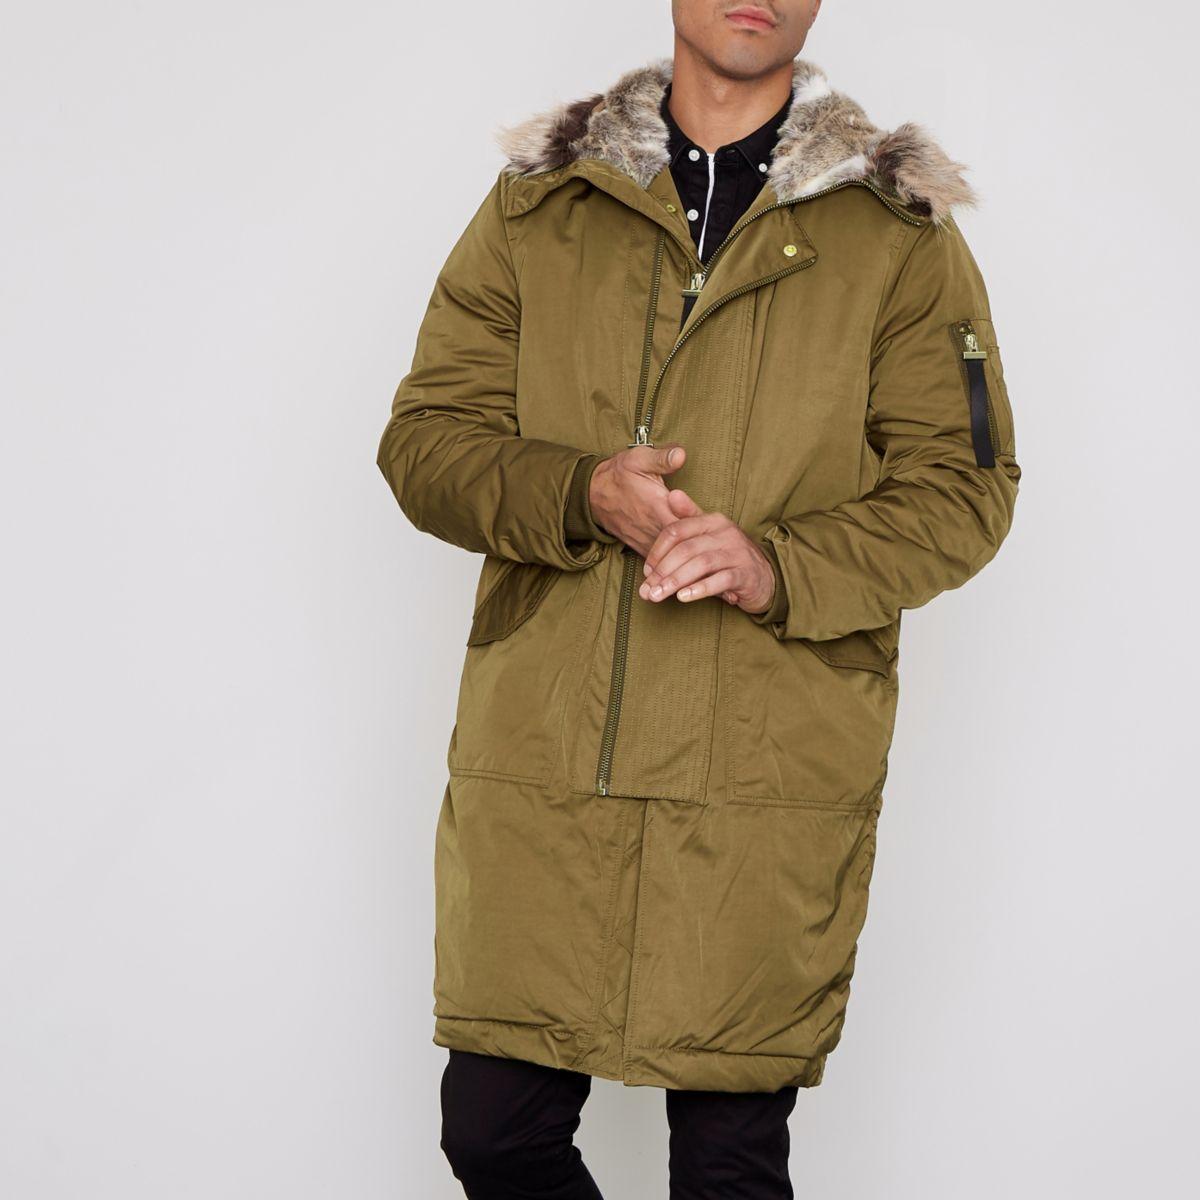 Khaki faux fur lined double zip hooded parka